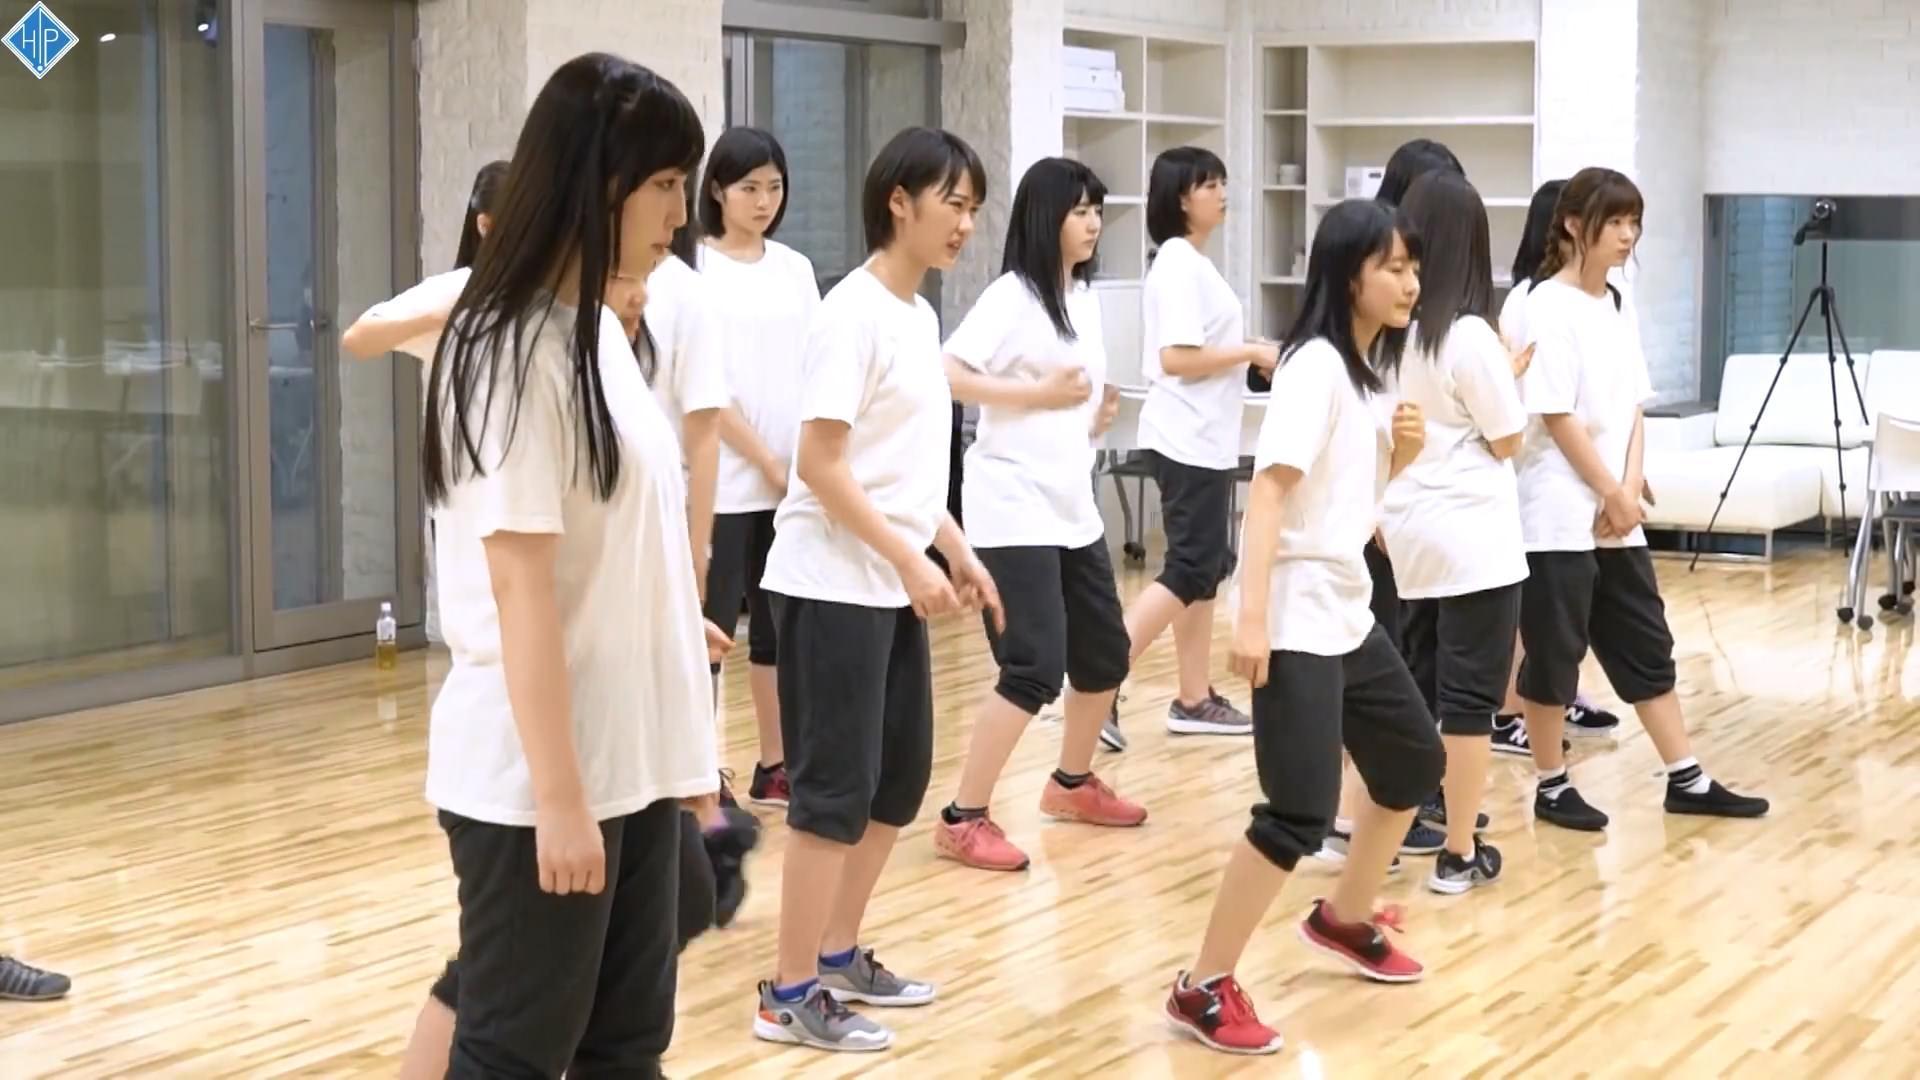 http://www.mybitchisajunky.com/whg/picture/lWdyg6P.jpg